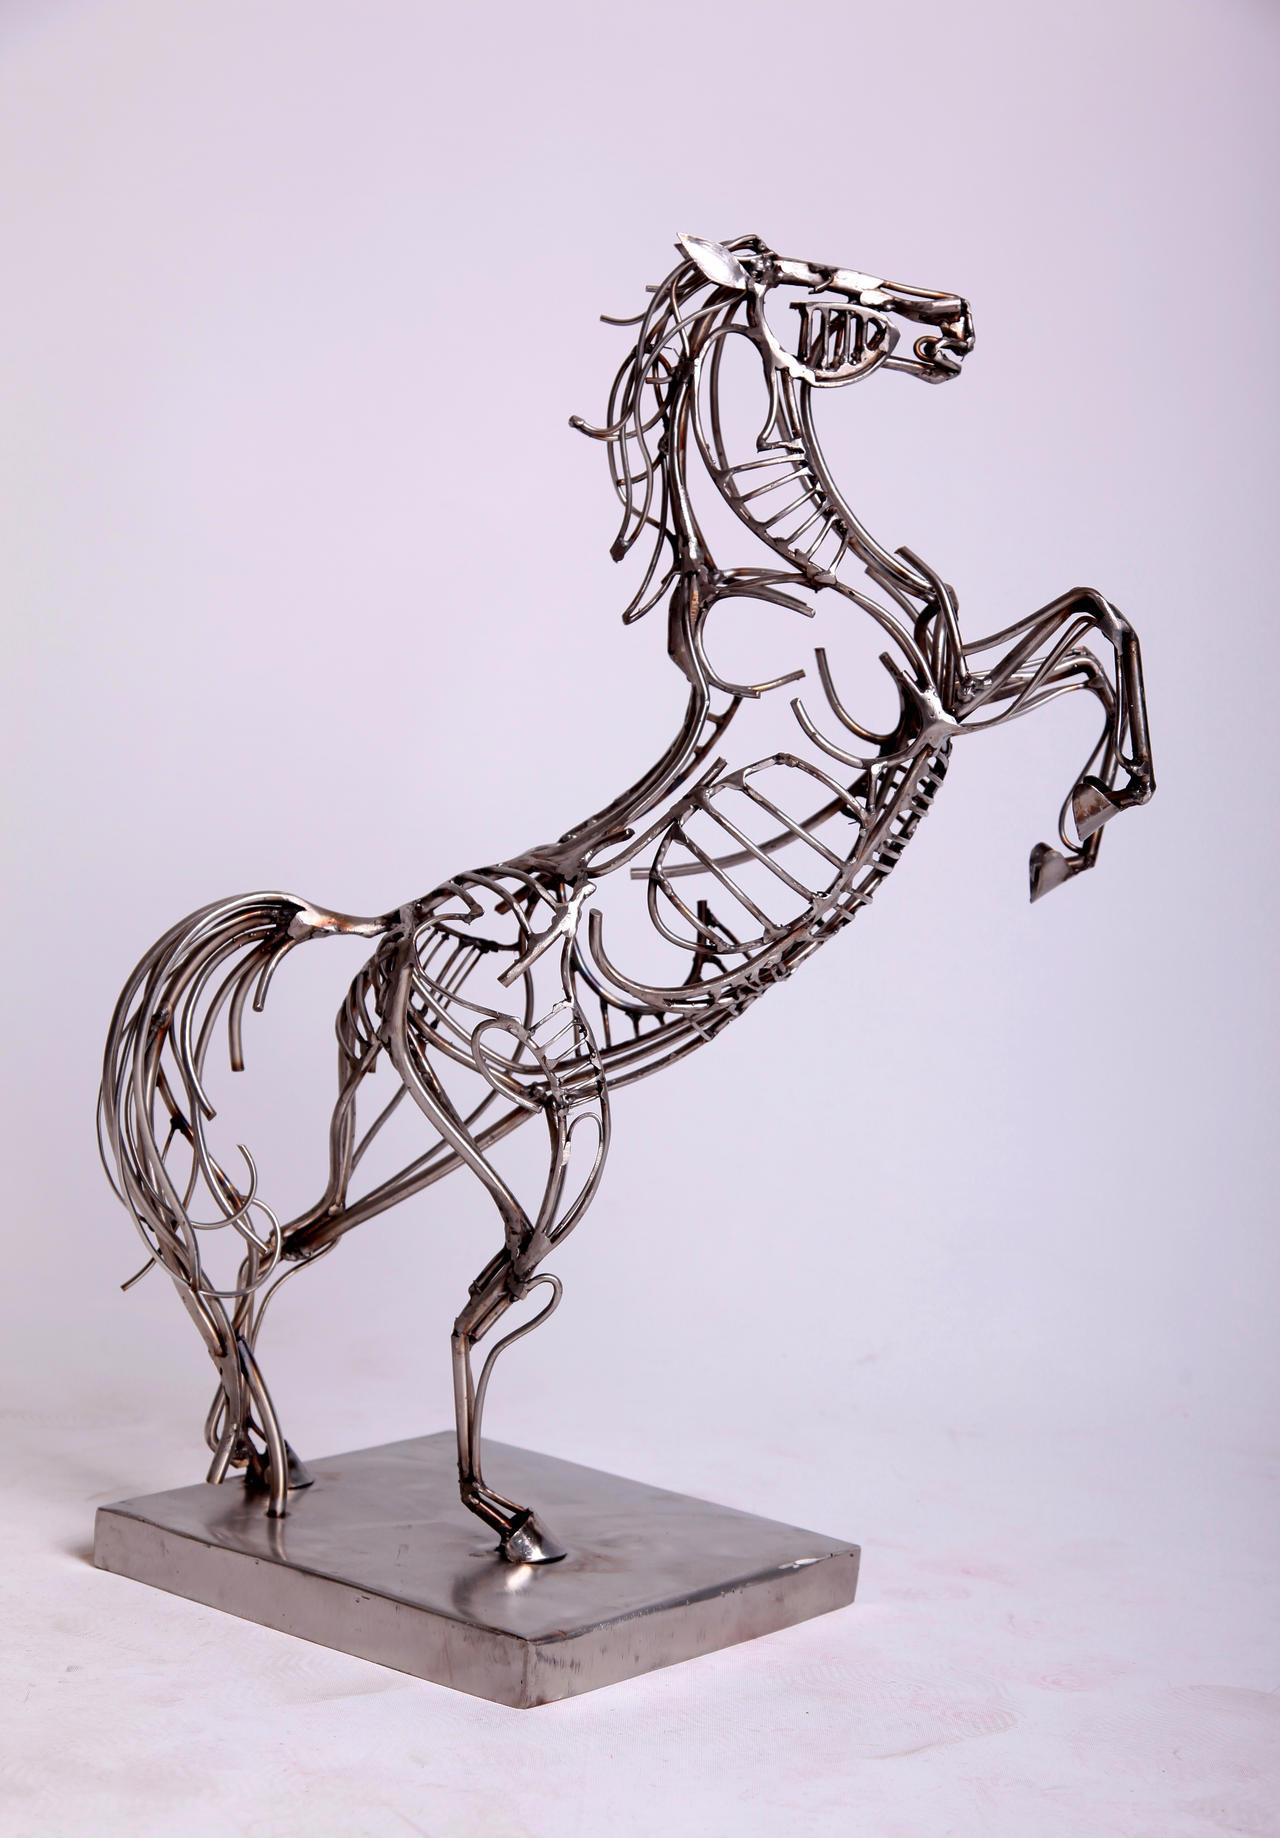 Prancing Horse by arifcekderi